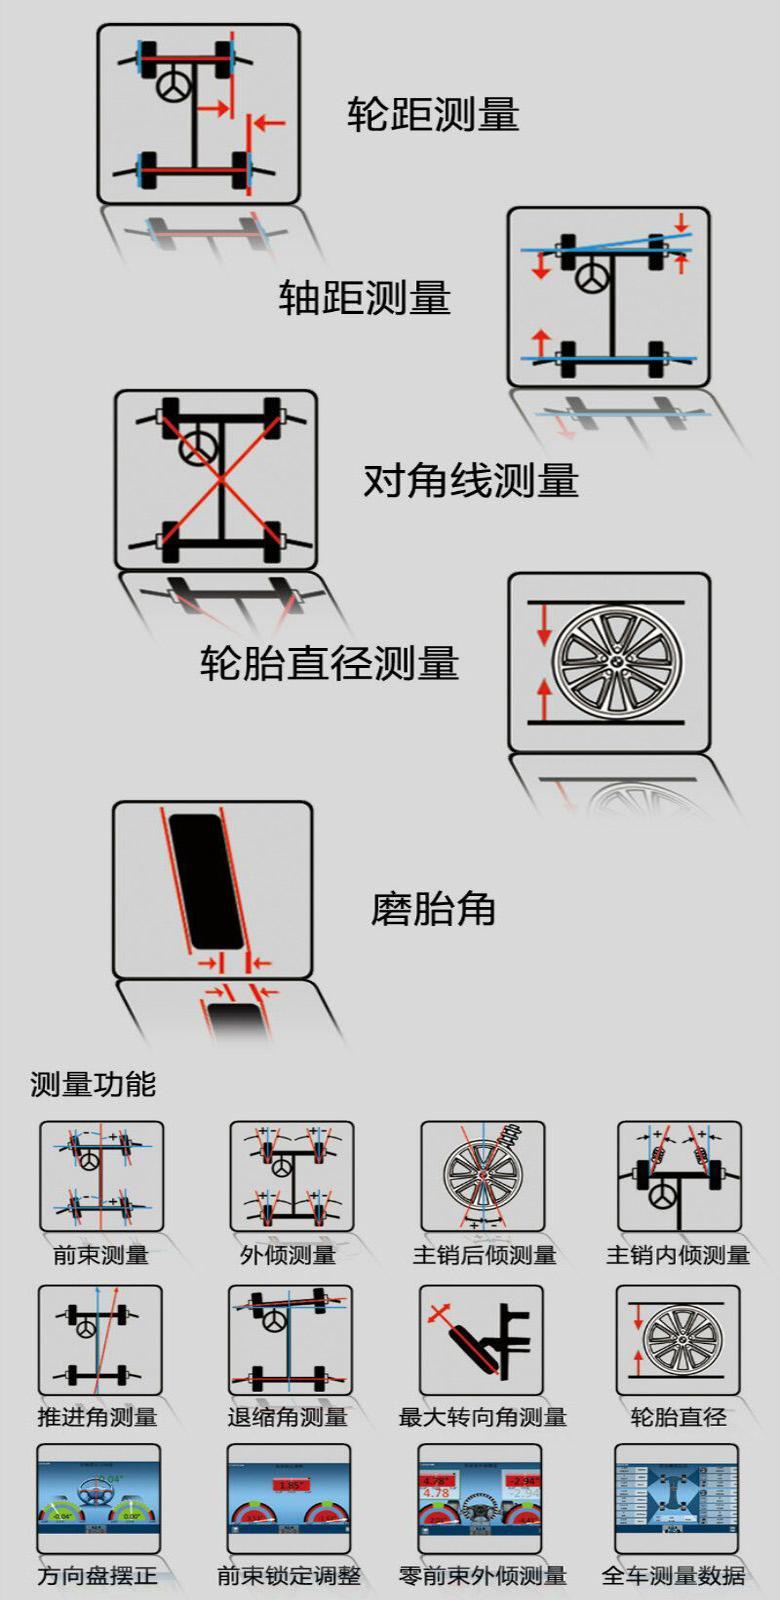 3D四輪定位儀 DT201ET 固定橫杆獨立機櫃雙屏款 4